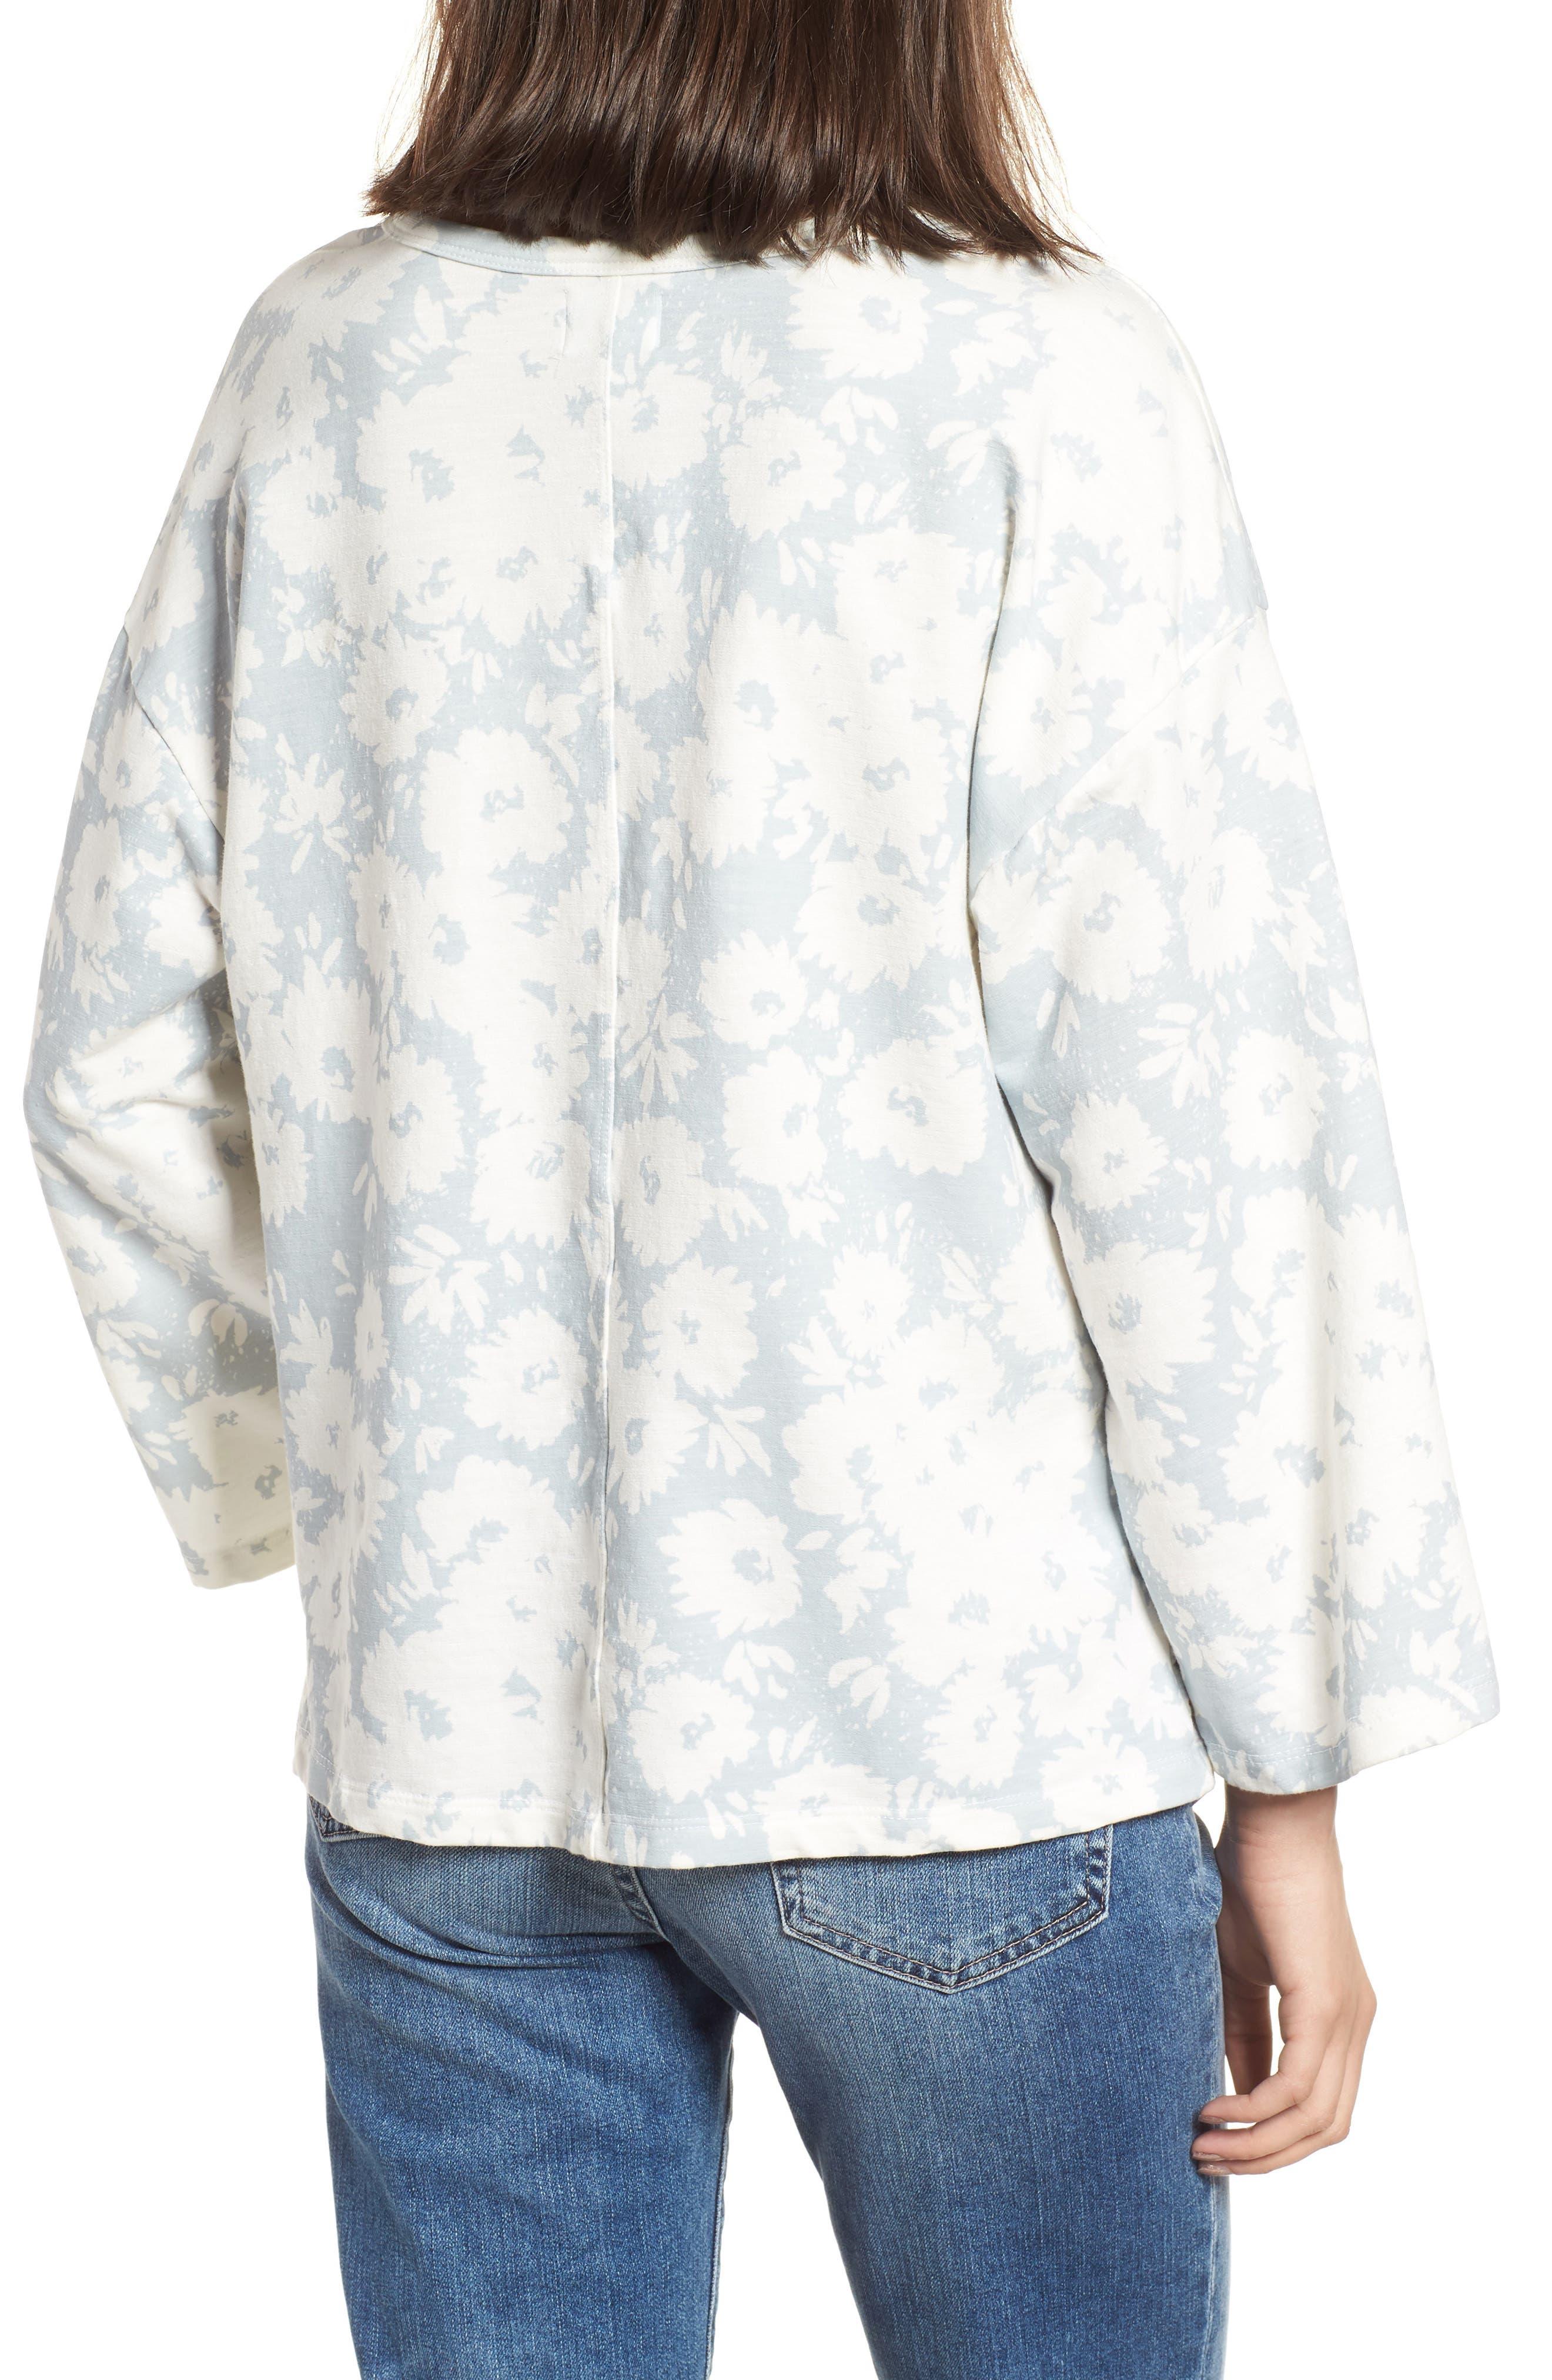 Kimono Sweatshirt,                             Alternate thumbnail 2, color,                             451